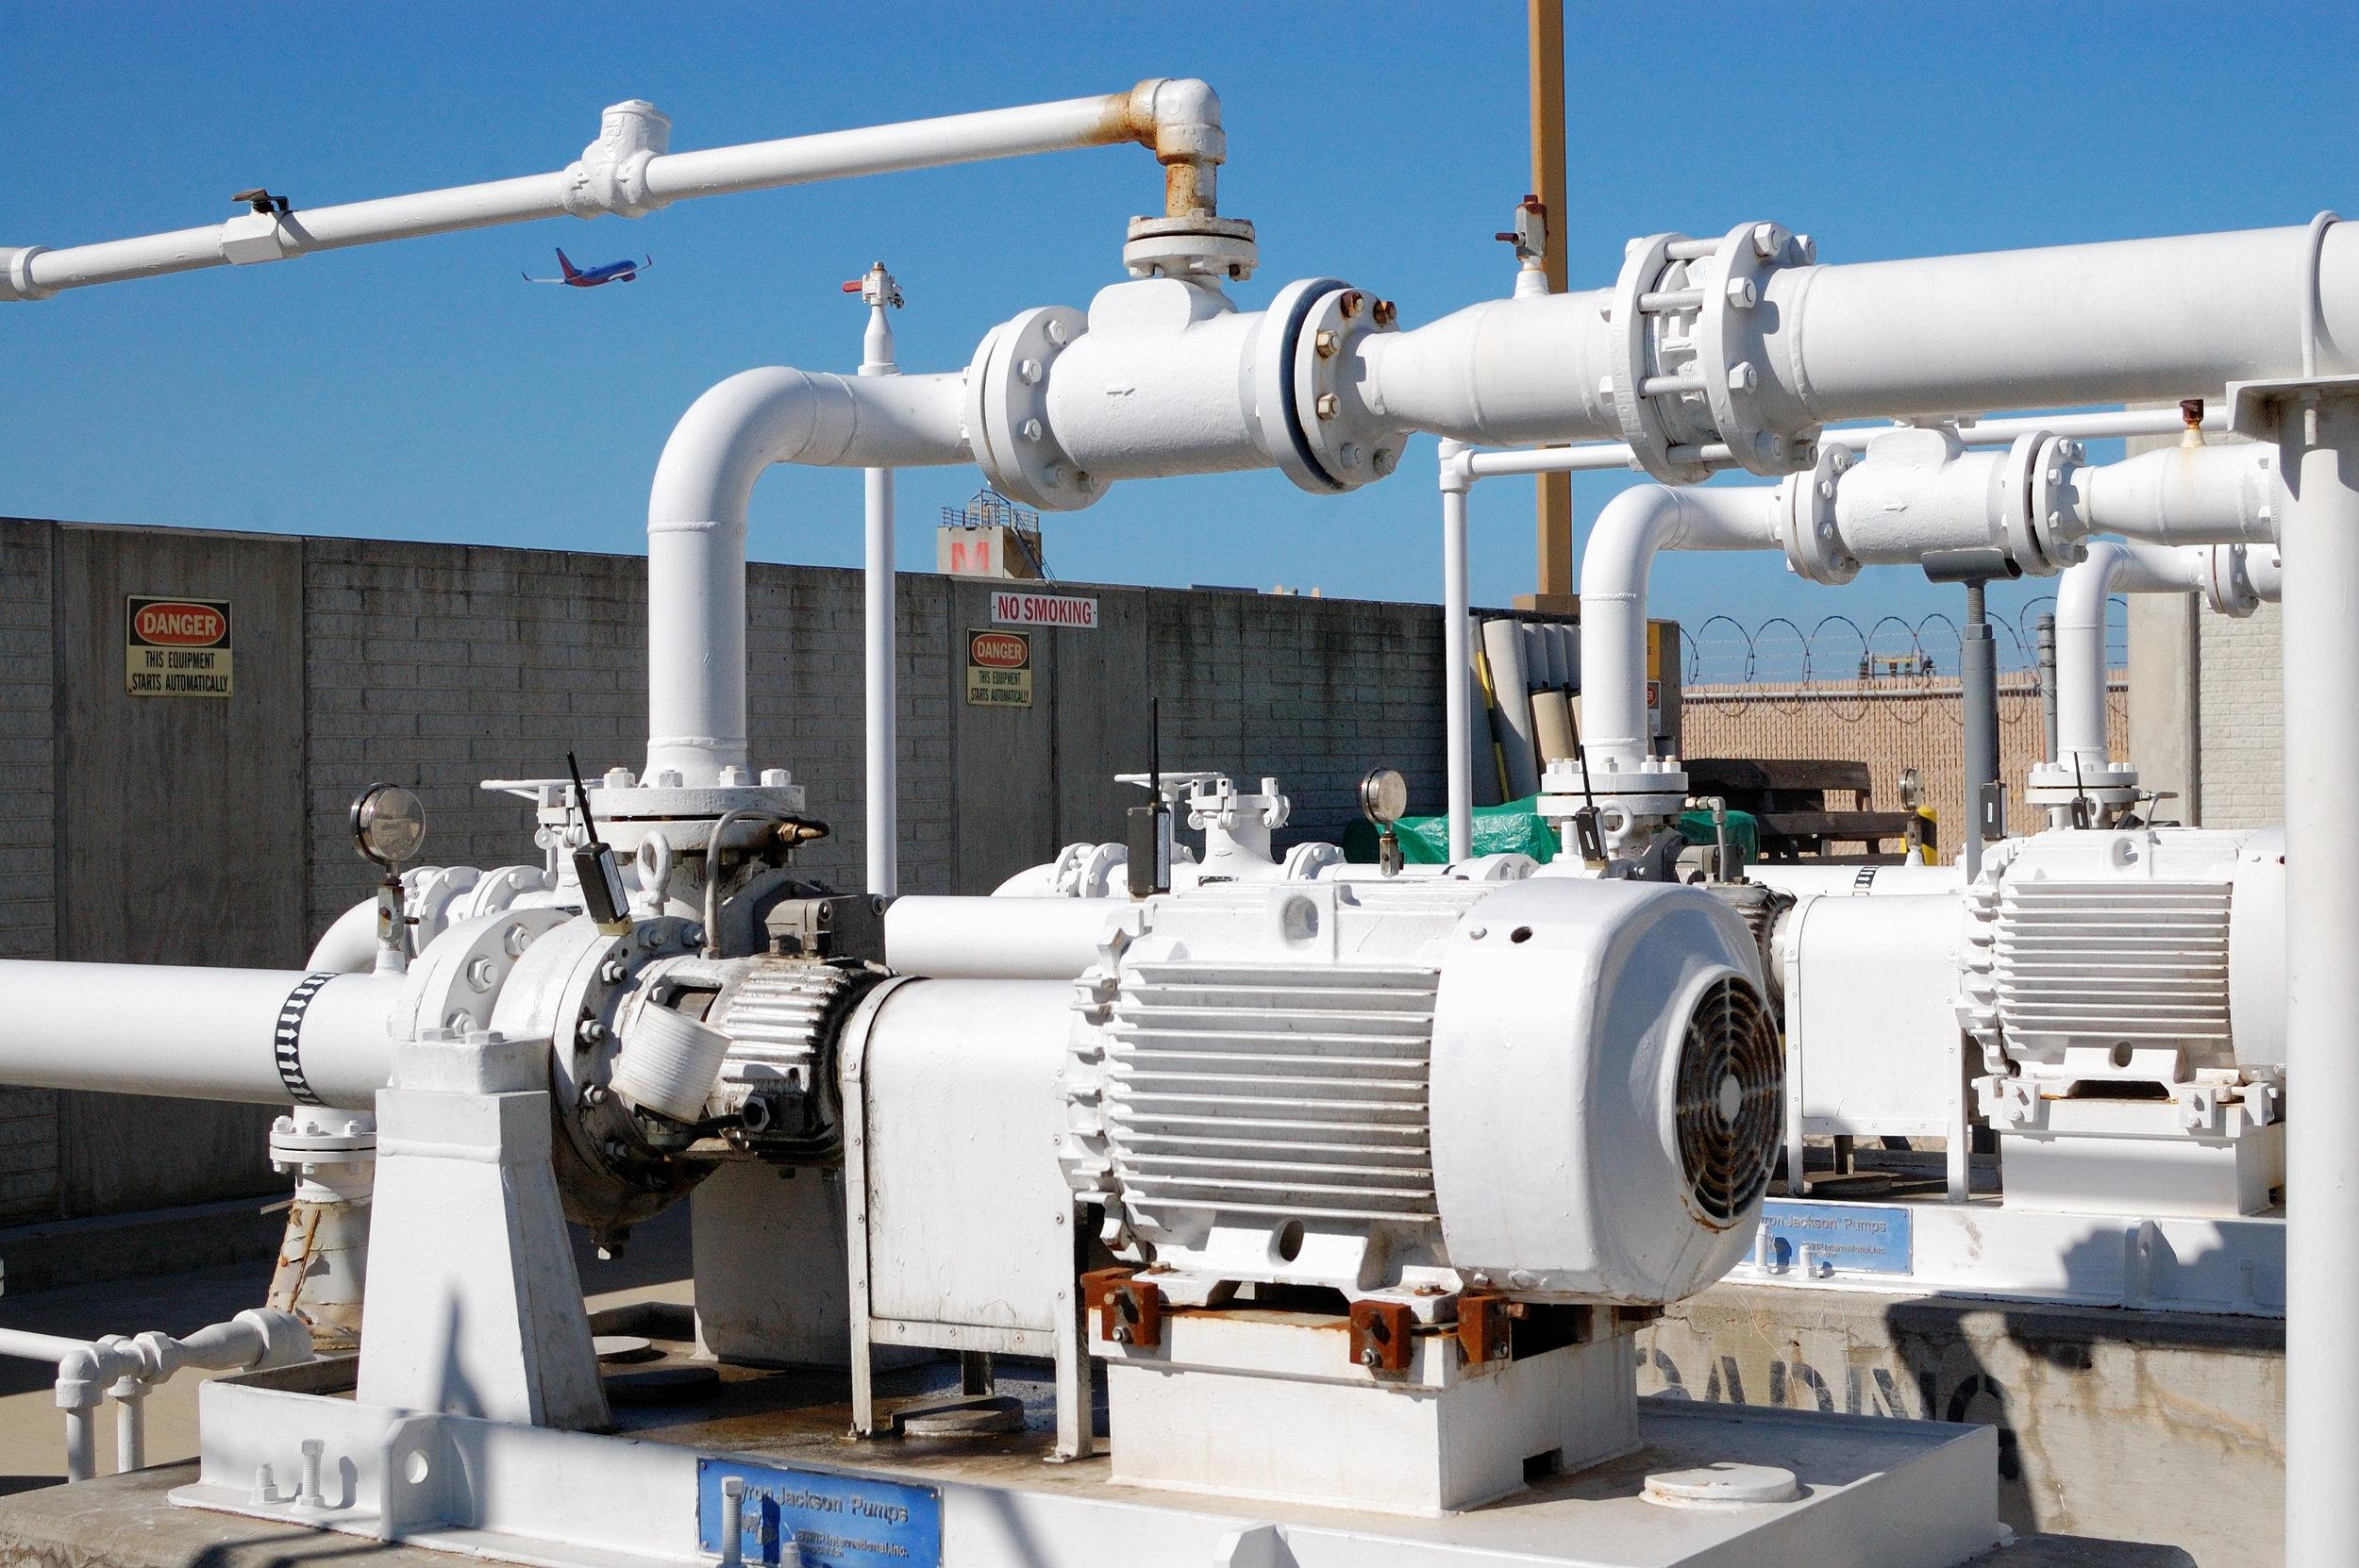 SmartHAWK wireless vibration and temperature sensors monitoring fuel pumps at a major California airport.